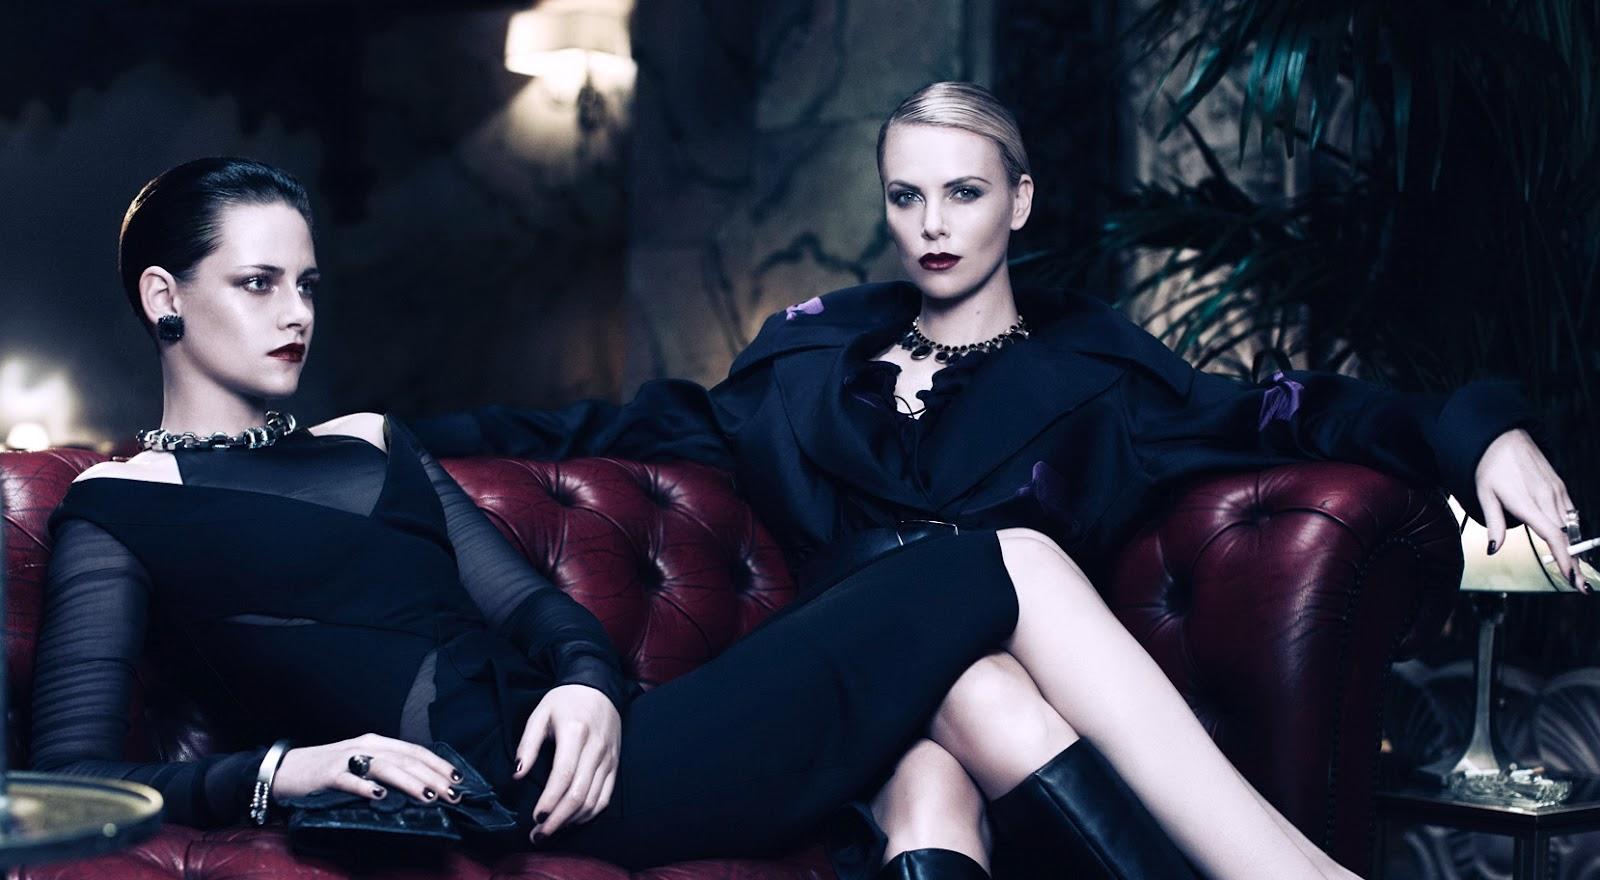 http://1.bp.blogspot.com/-L960Ho1BZtE/T8bNYX1p3zI/AAAAAAAAGus/o2Mpv0wX2uE/s1600/Kristen+Stewart+and+Charlize+Theron+in+Interview+Magazine+2012.jpg